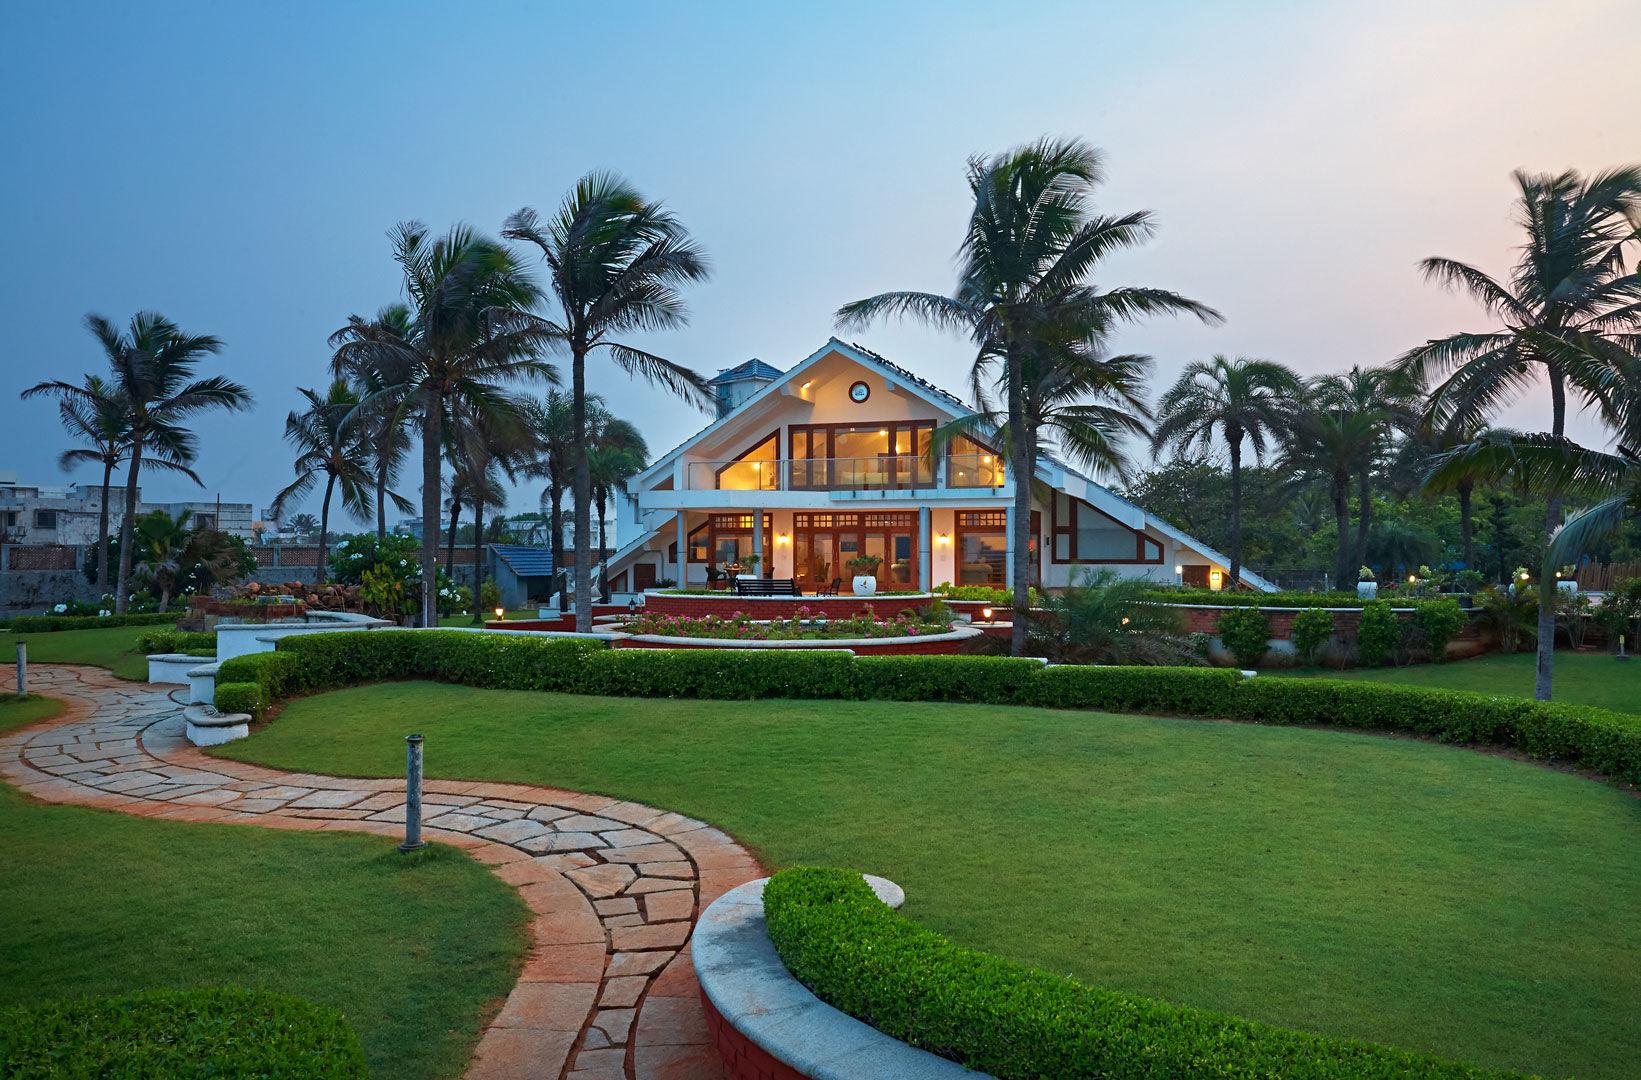 Beach Wedding Venue in ECR   Villas for Rent in ECR   Outdoor Wedding Venue in ECR   Beach Resort for Wedding in ECR   Outdoor Wedding Location – The Blue House